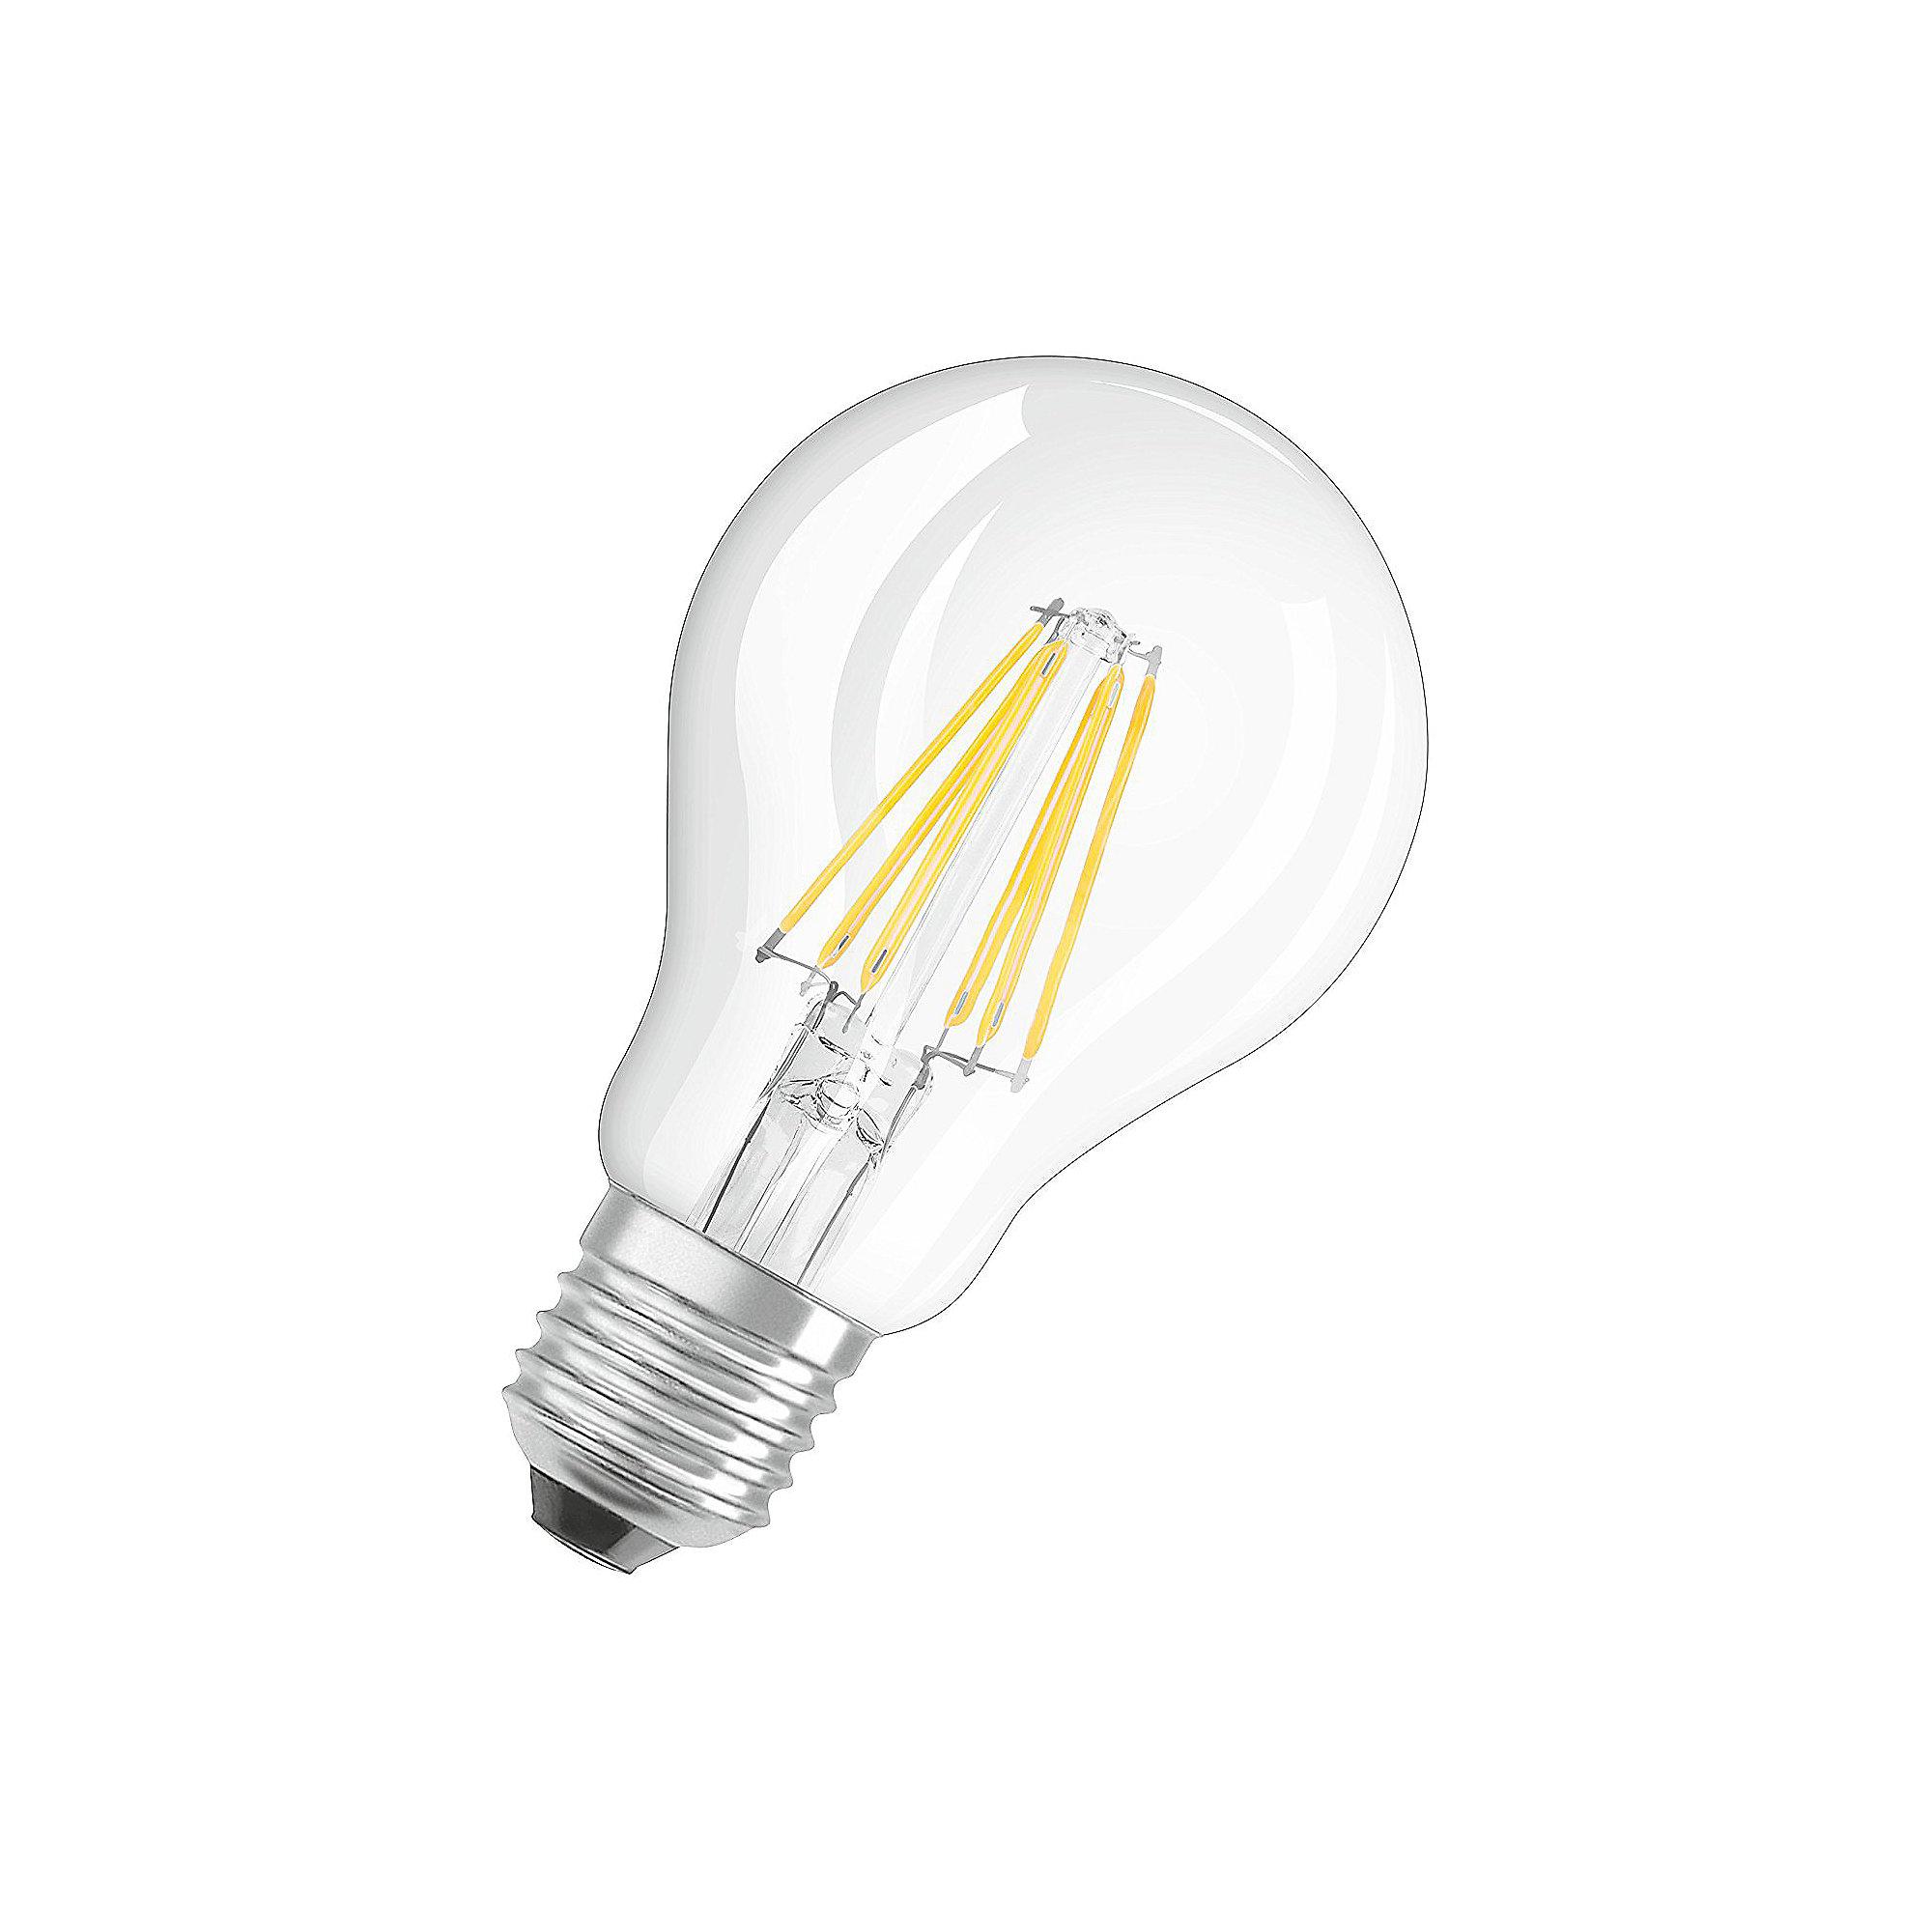 osram led star glowdim classic a birne 7w e27 filament klar warmwei dimmbar cyberport. Black Bedroom Furniture Sets. Home Design Ideas